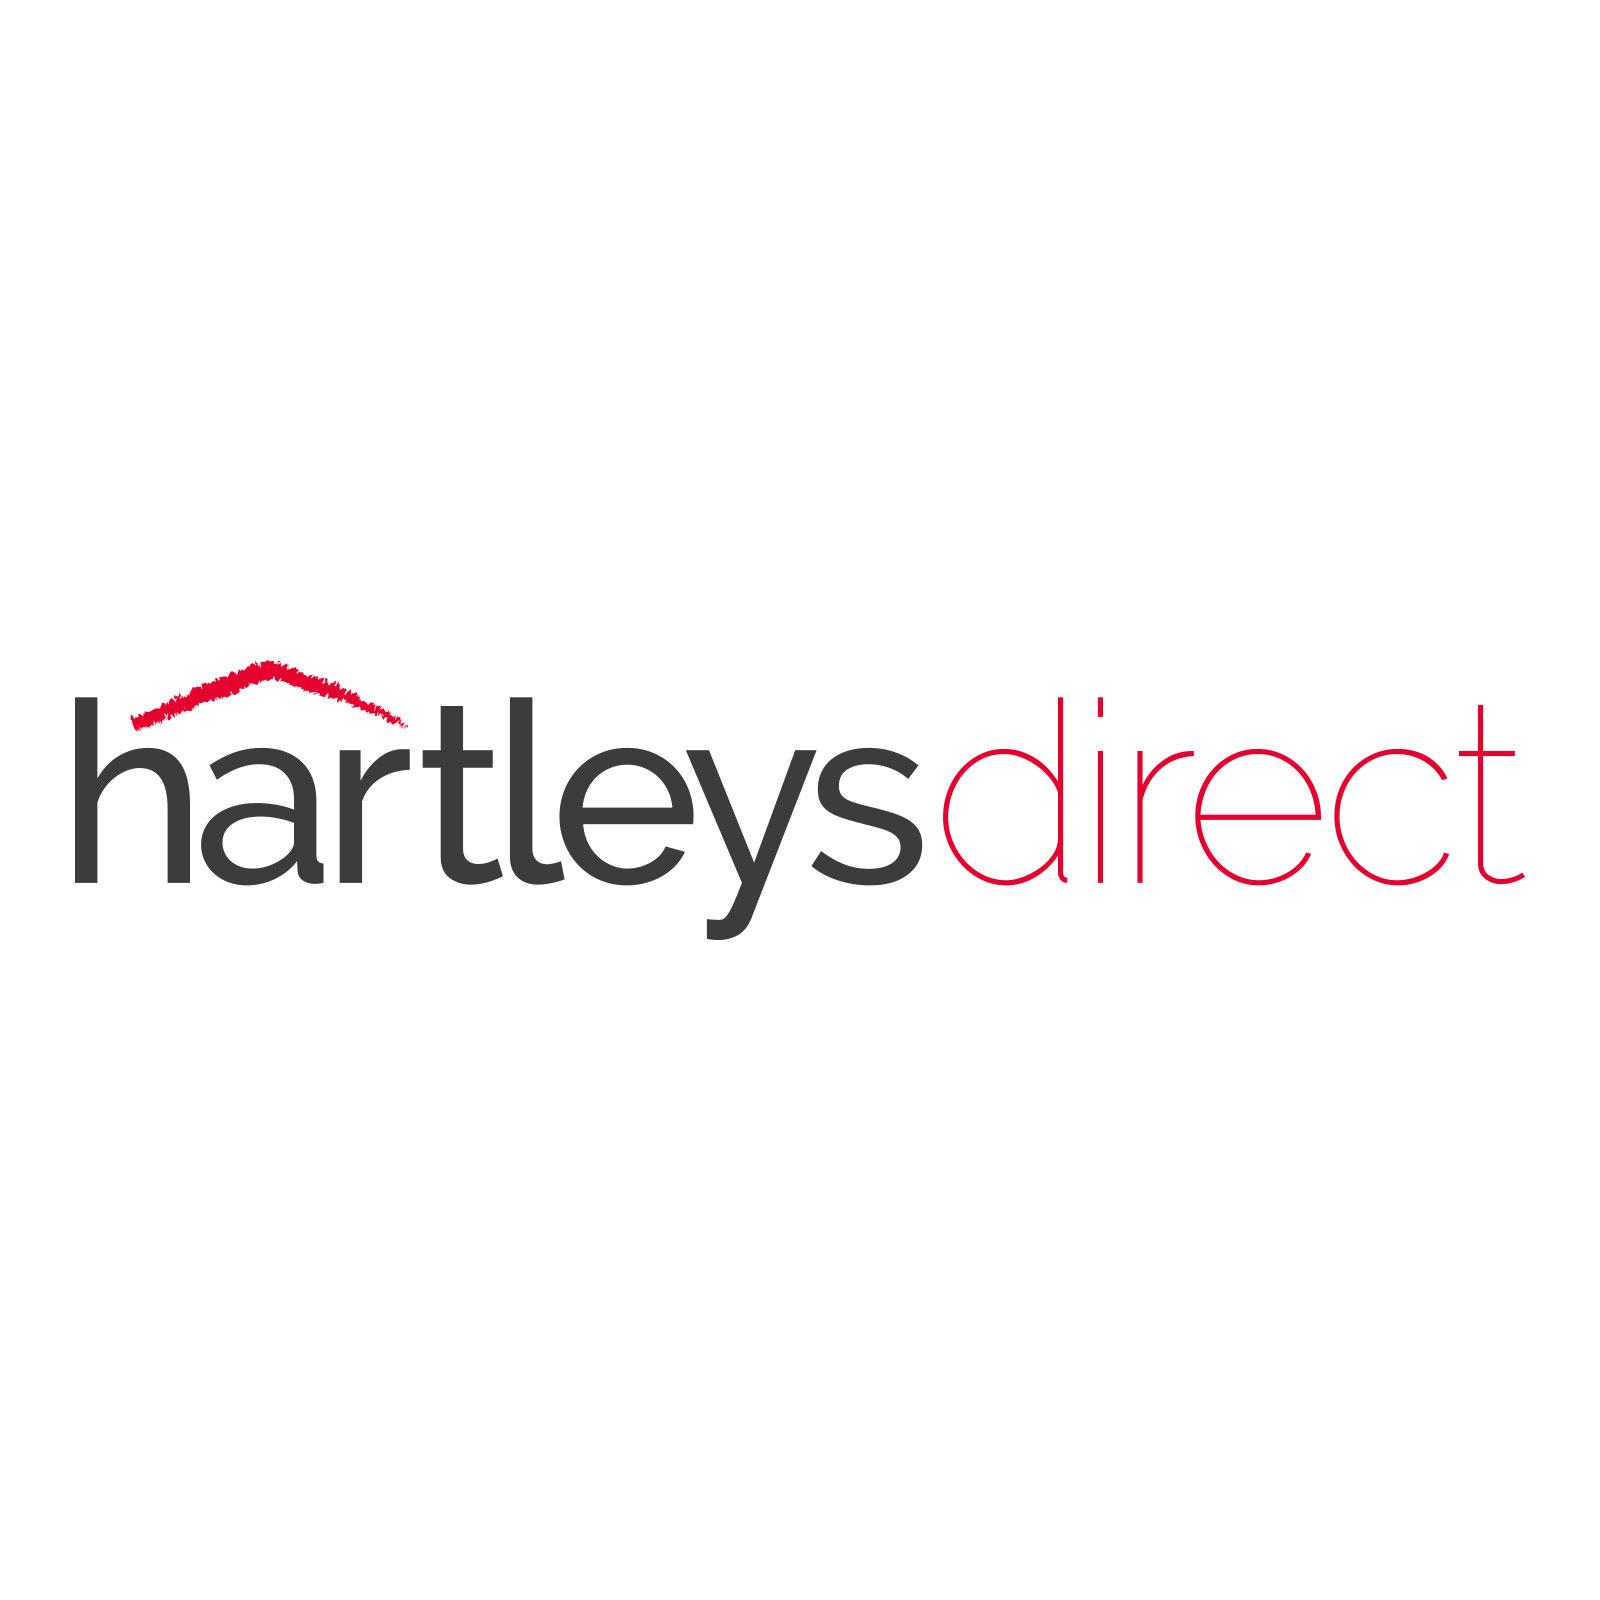 Hartleys-Grey-Shutter-Mirror-with-One-Shutter-Open-on-White-Background.jpg